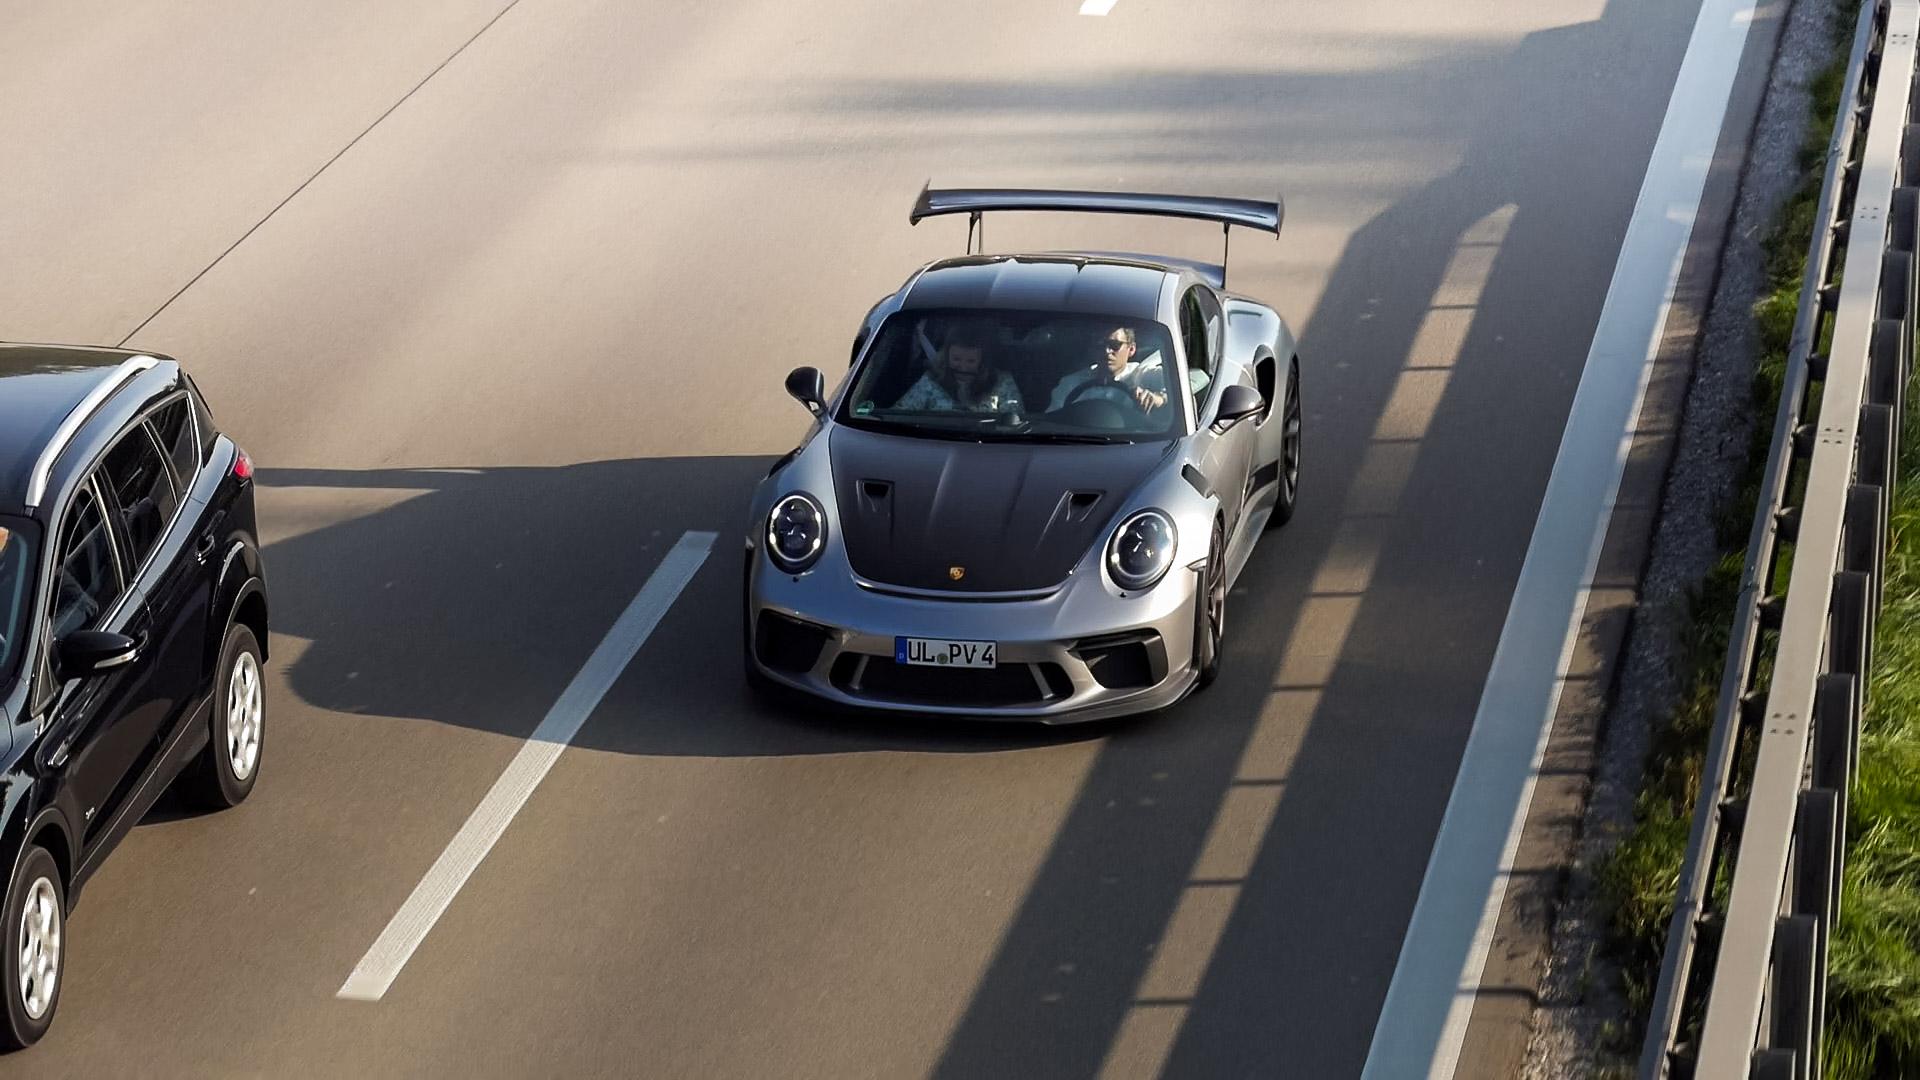 Porsche 911 991.2 GT3 RS - UL-PV-4